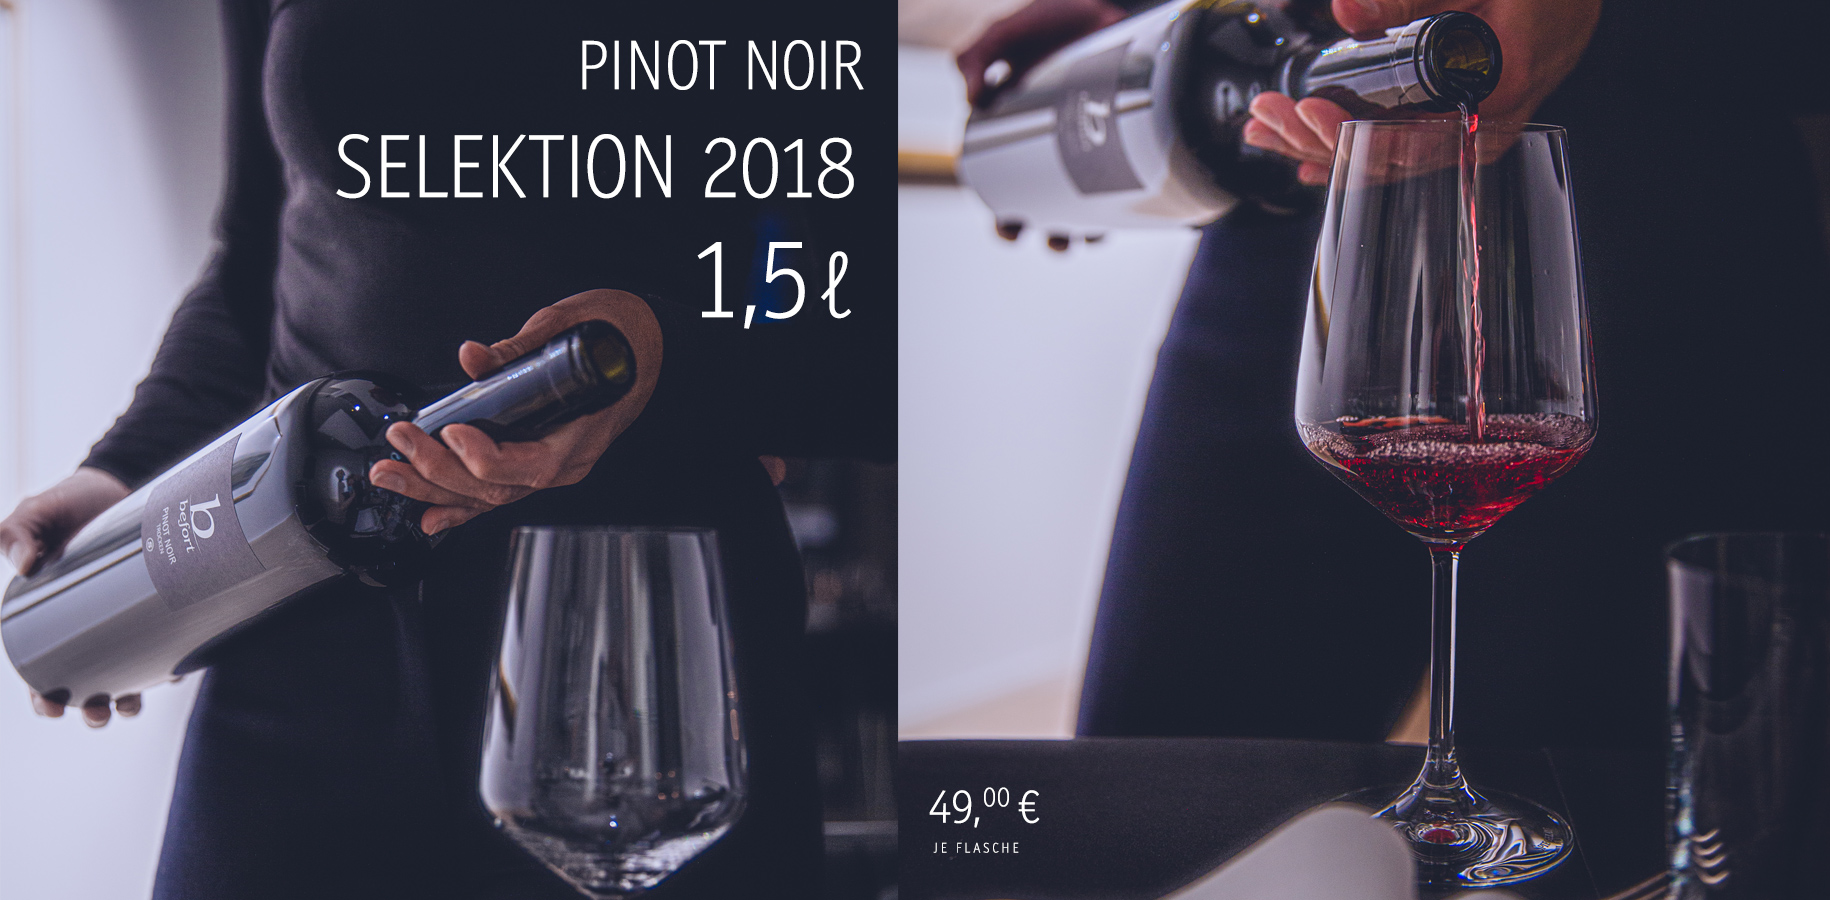 Pinot Noir »S«, Magnum 1,5L, 49,00€/Fl. (inkl. Versandkosten)